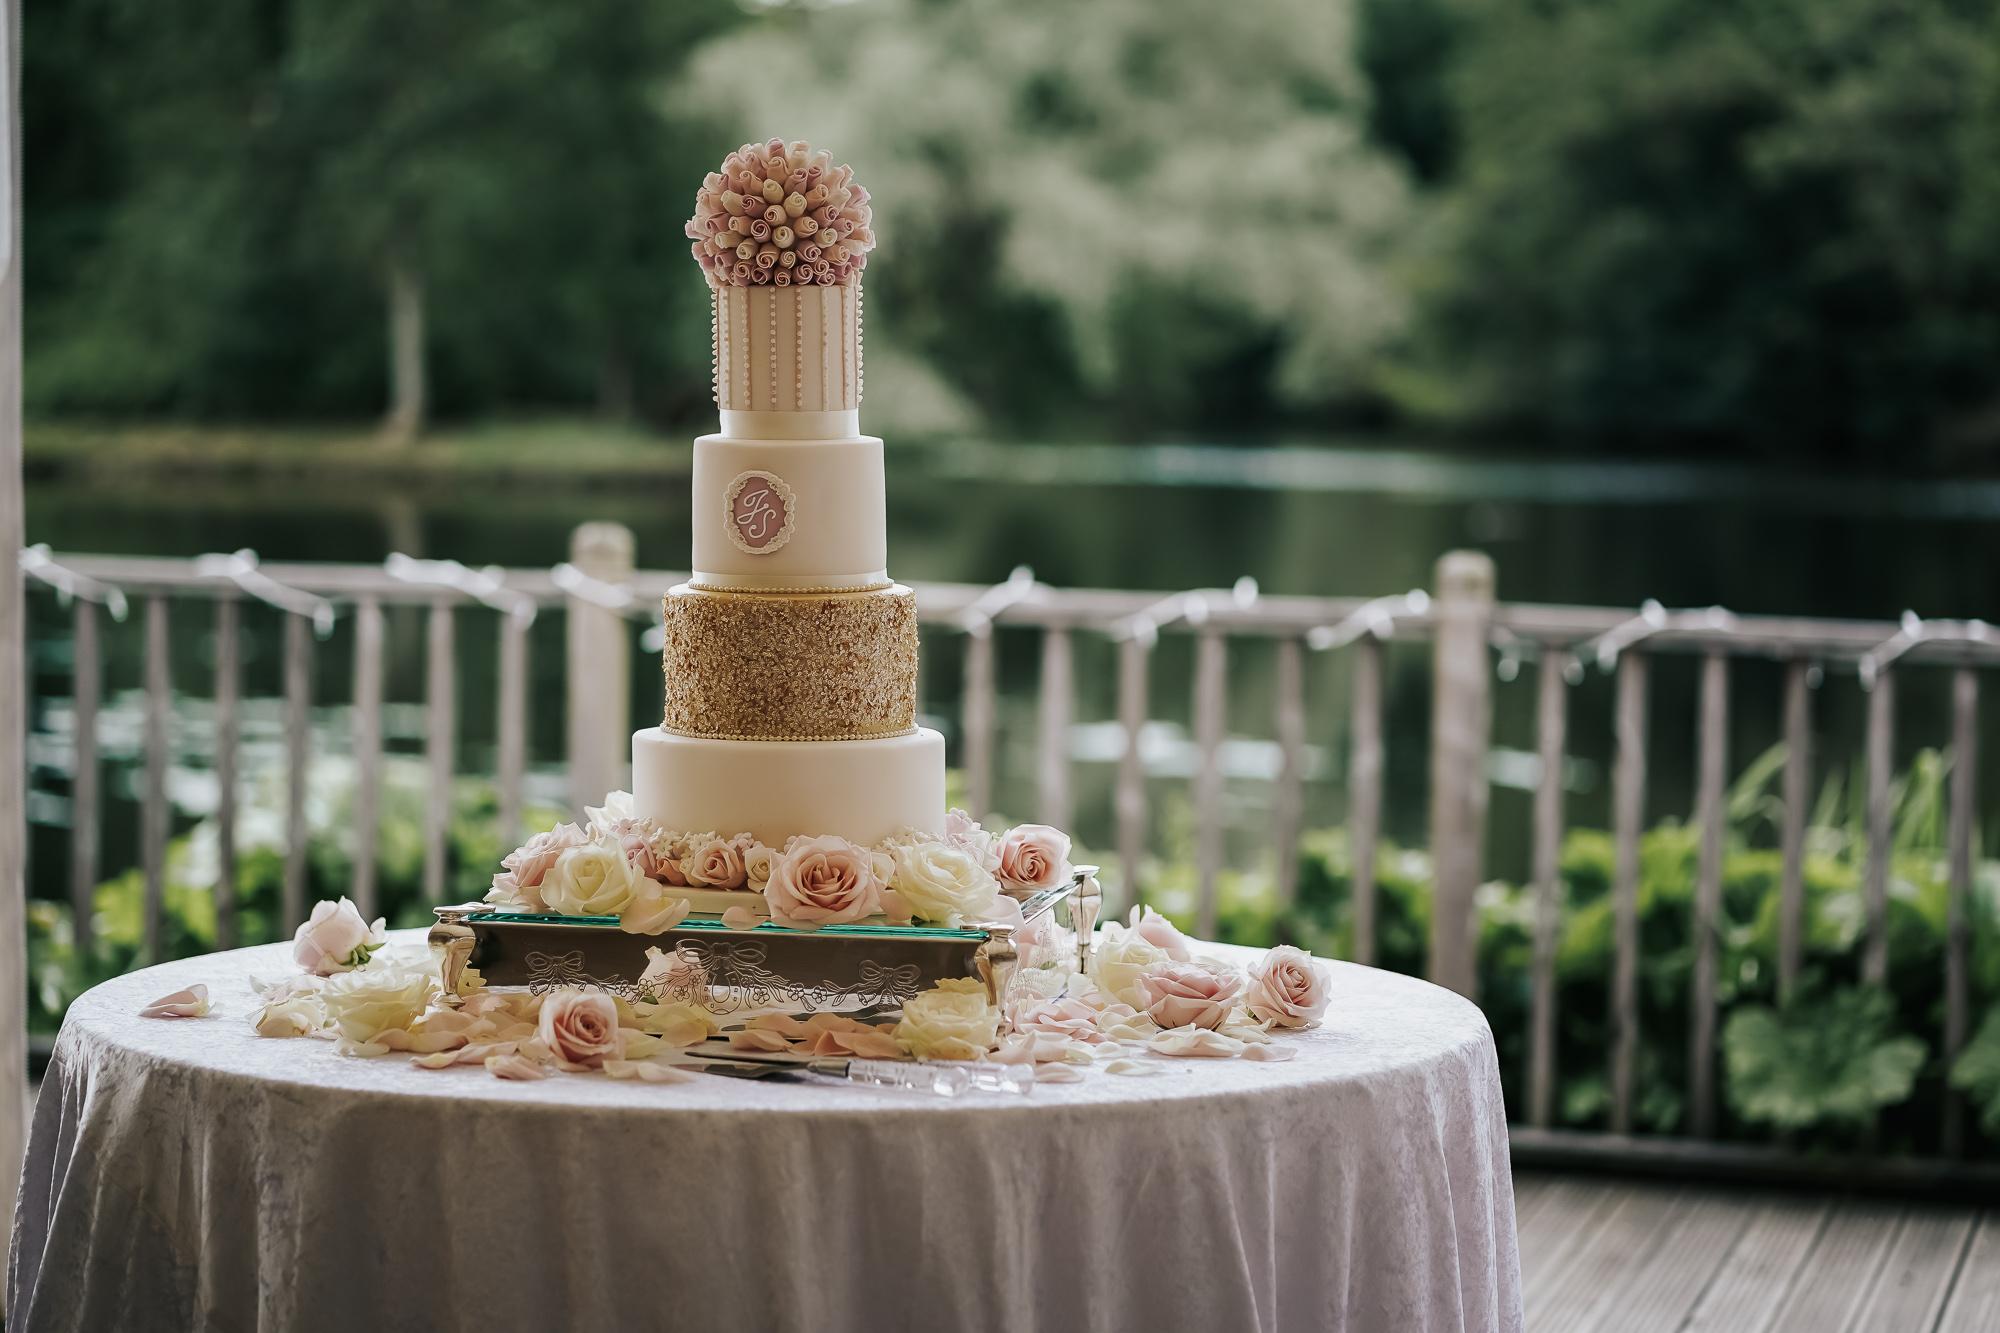 Thornton Manor Lakeside Marquee Wedding Photographer  (31 of 53).jpg